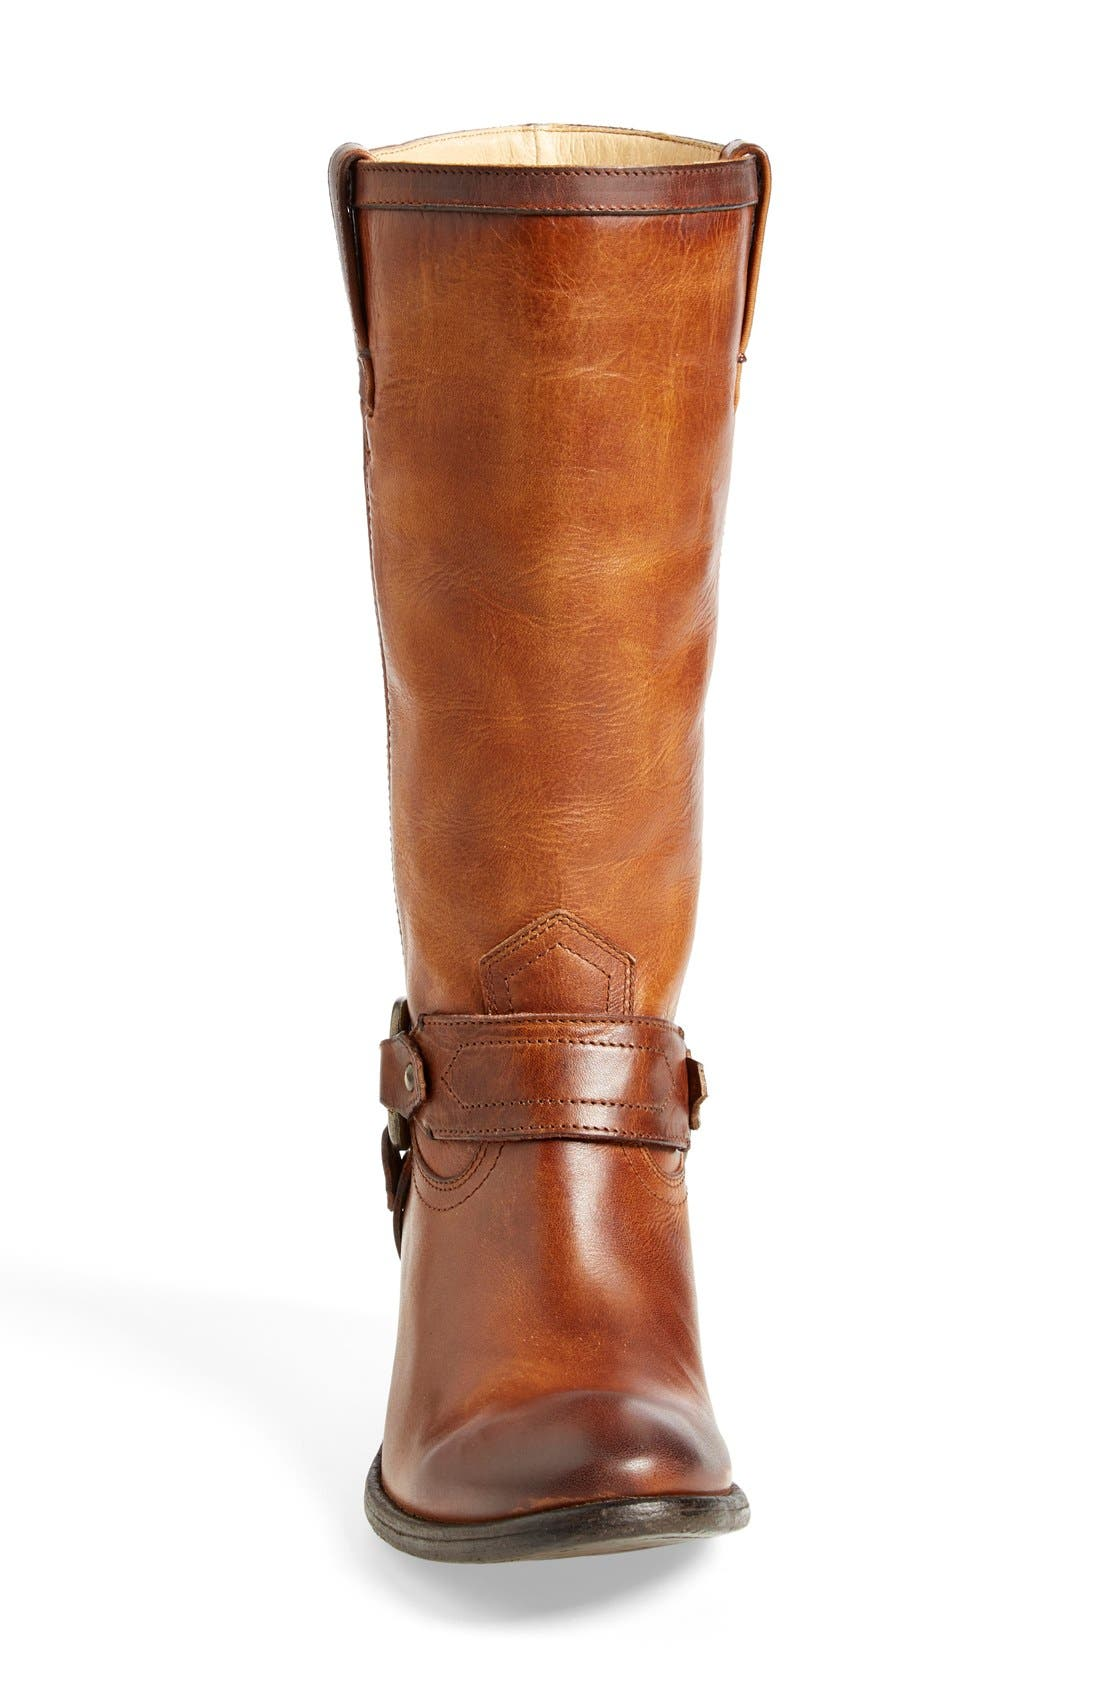 Alternate Image 3  - Frye 'Carson Harness' Western Mid Calf Riding Boot (Women)